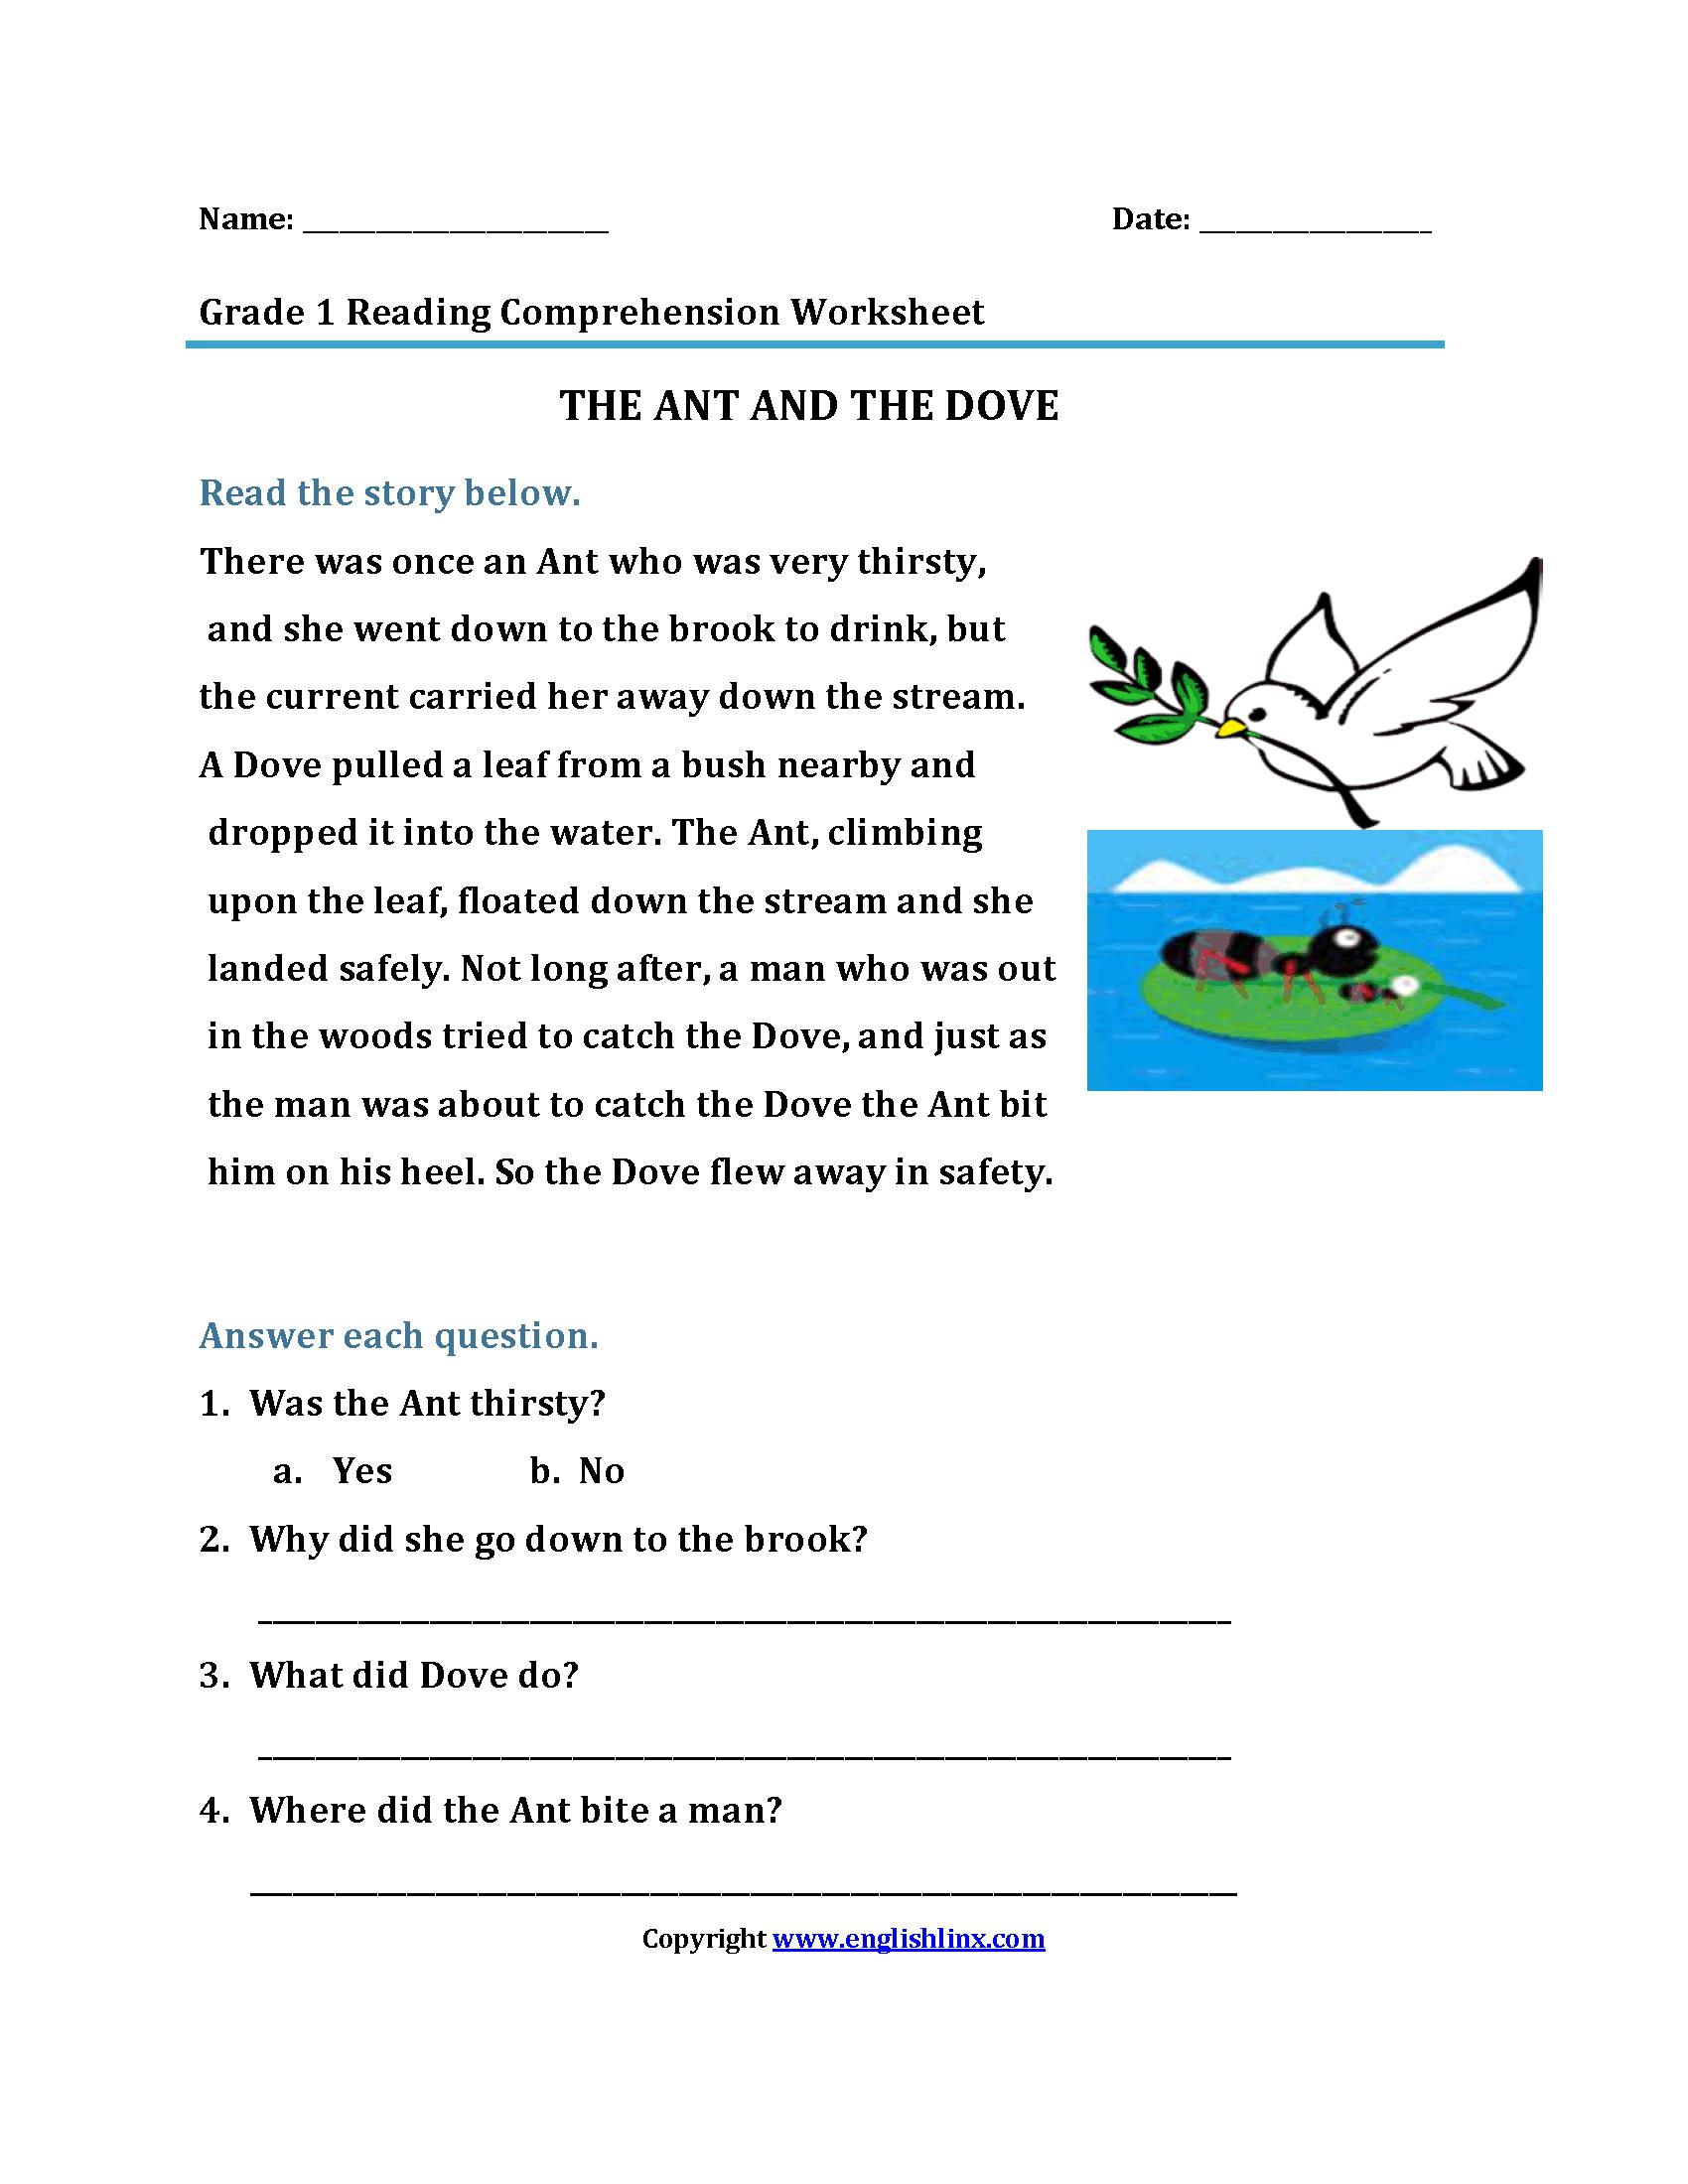 All Worksheets printable comprehension worksheets : Englishlinx.com : English Worksheets